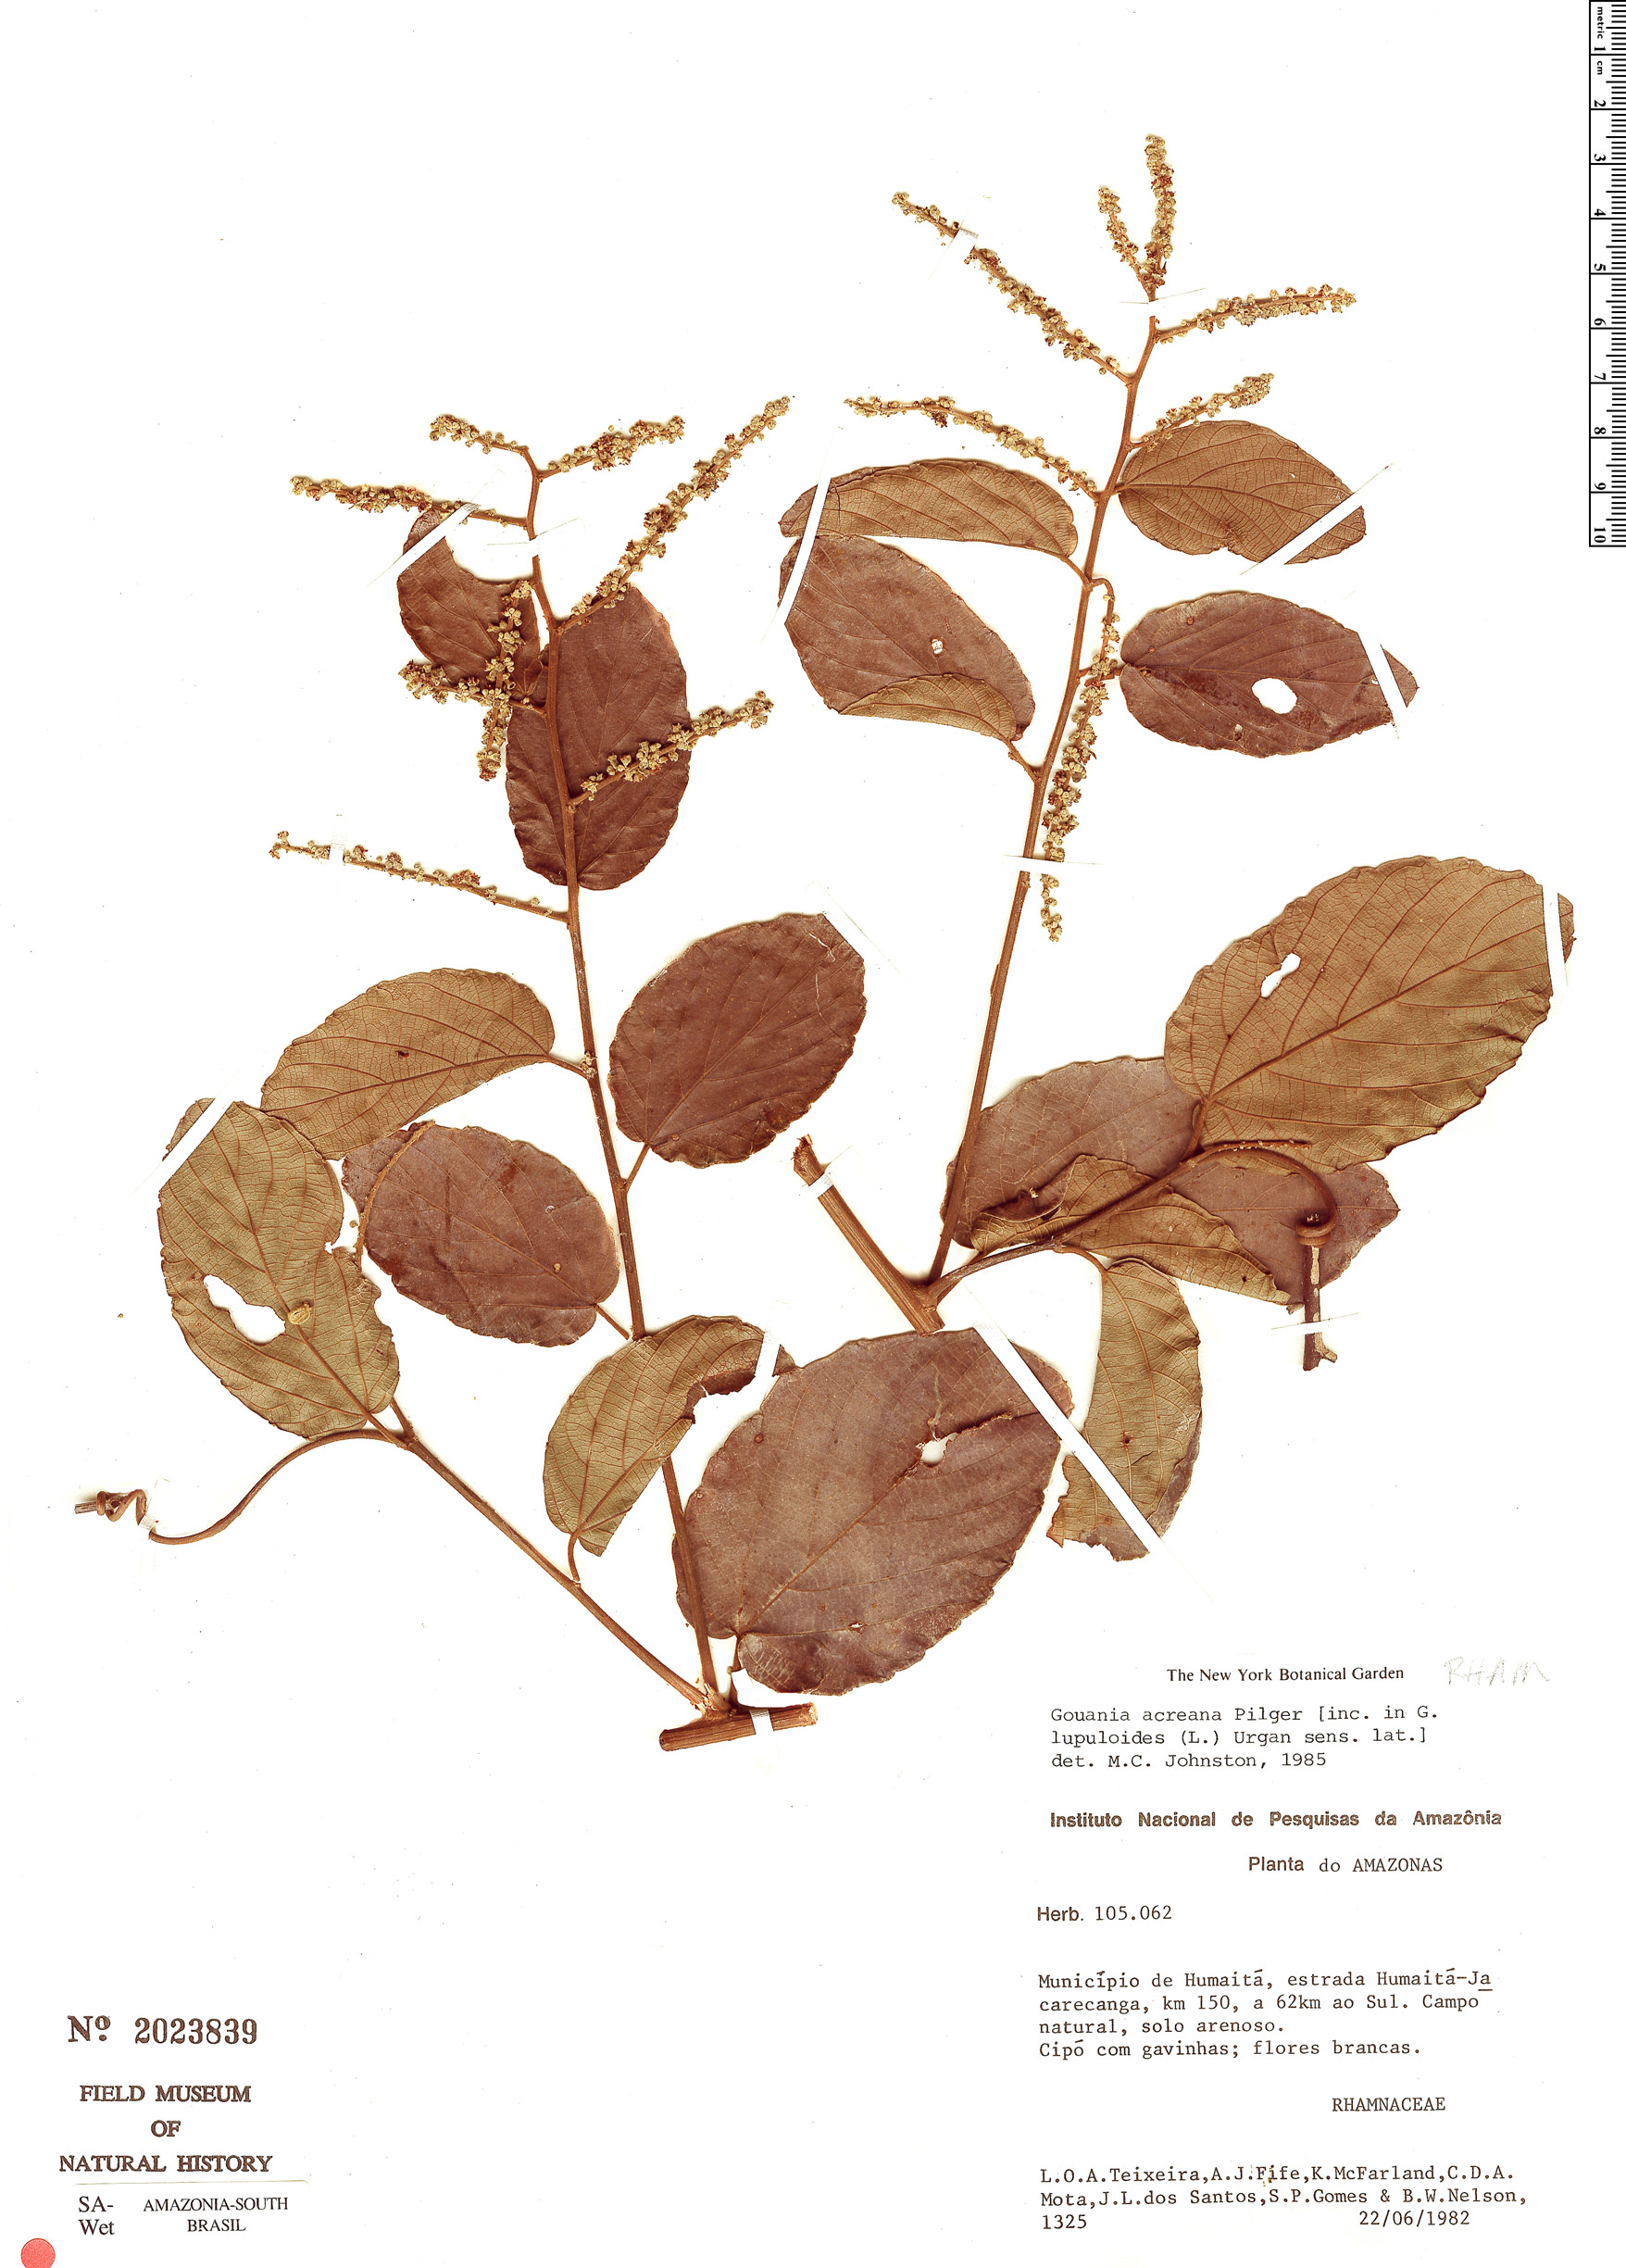 Specimen: Gouania acreana